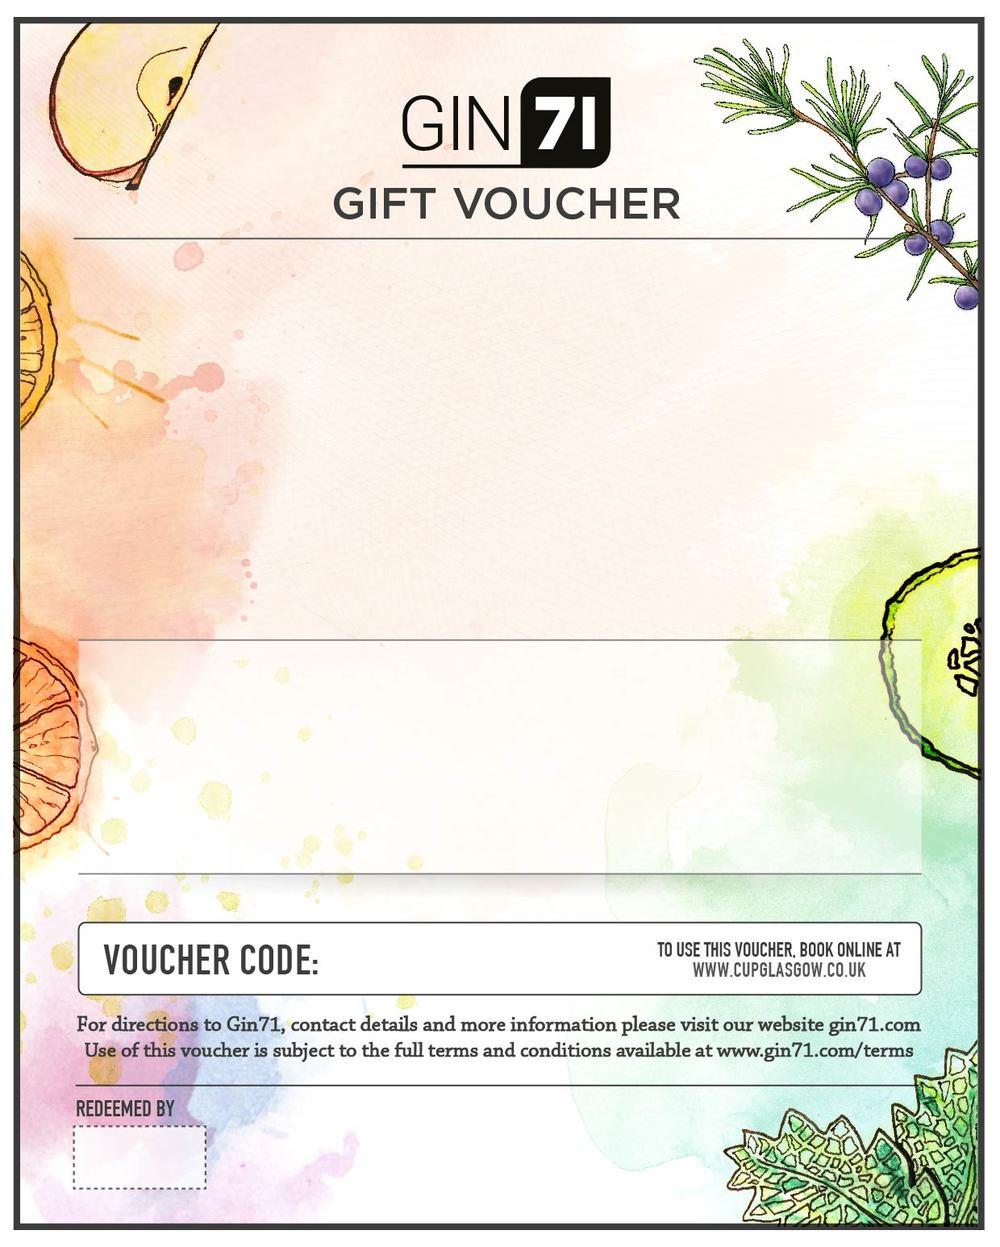 Gifts Gin71 Gift Voucher Vouchers